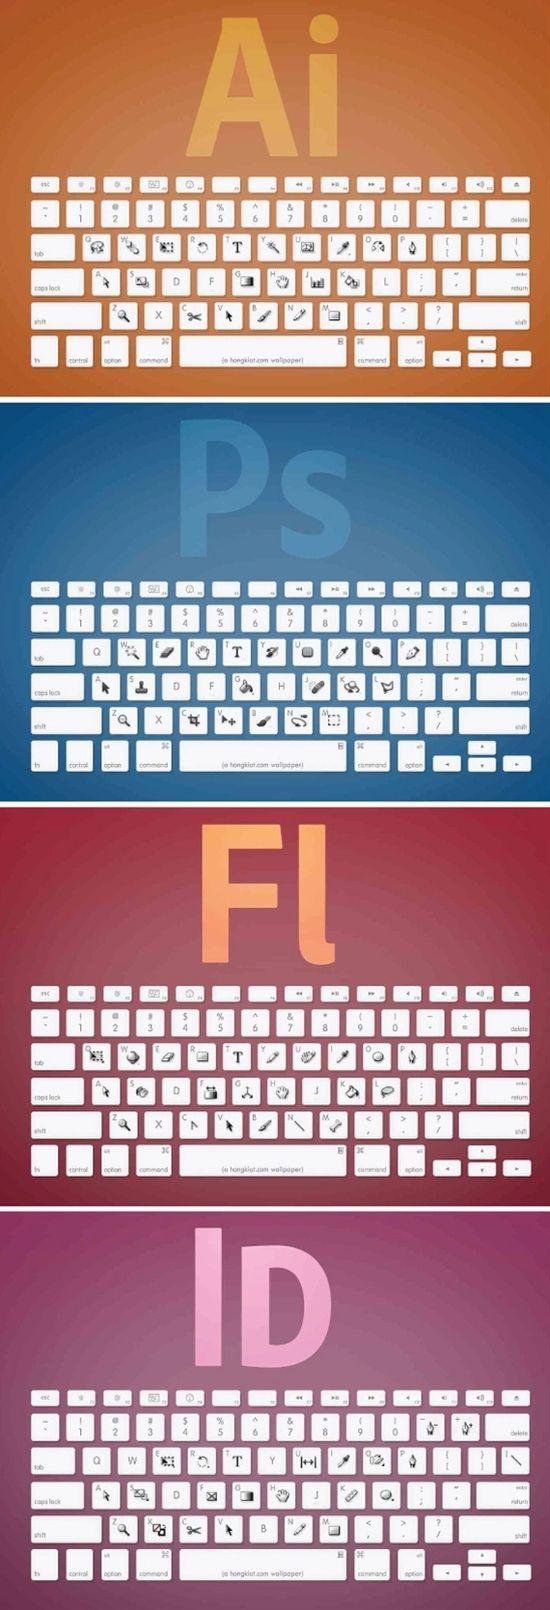 adobe shortcuts - adobe shortcuts Repinly Design Popular